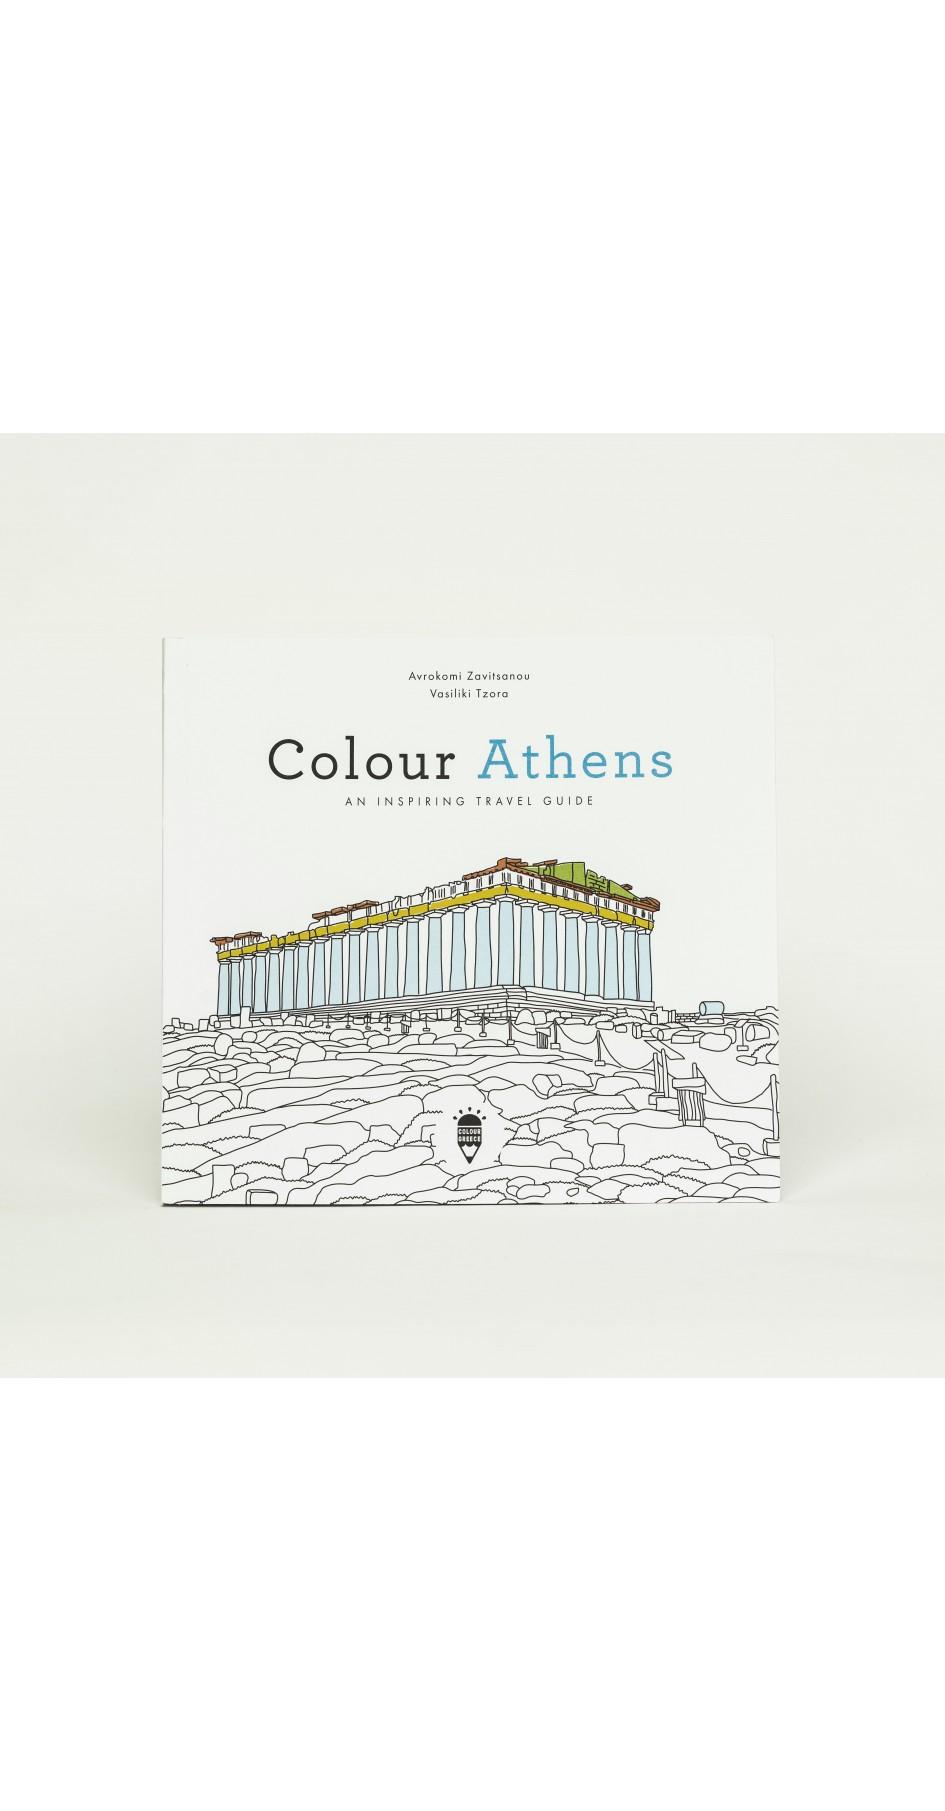 Colour Athens